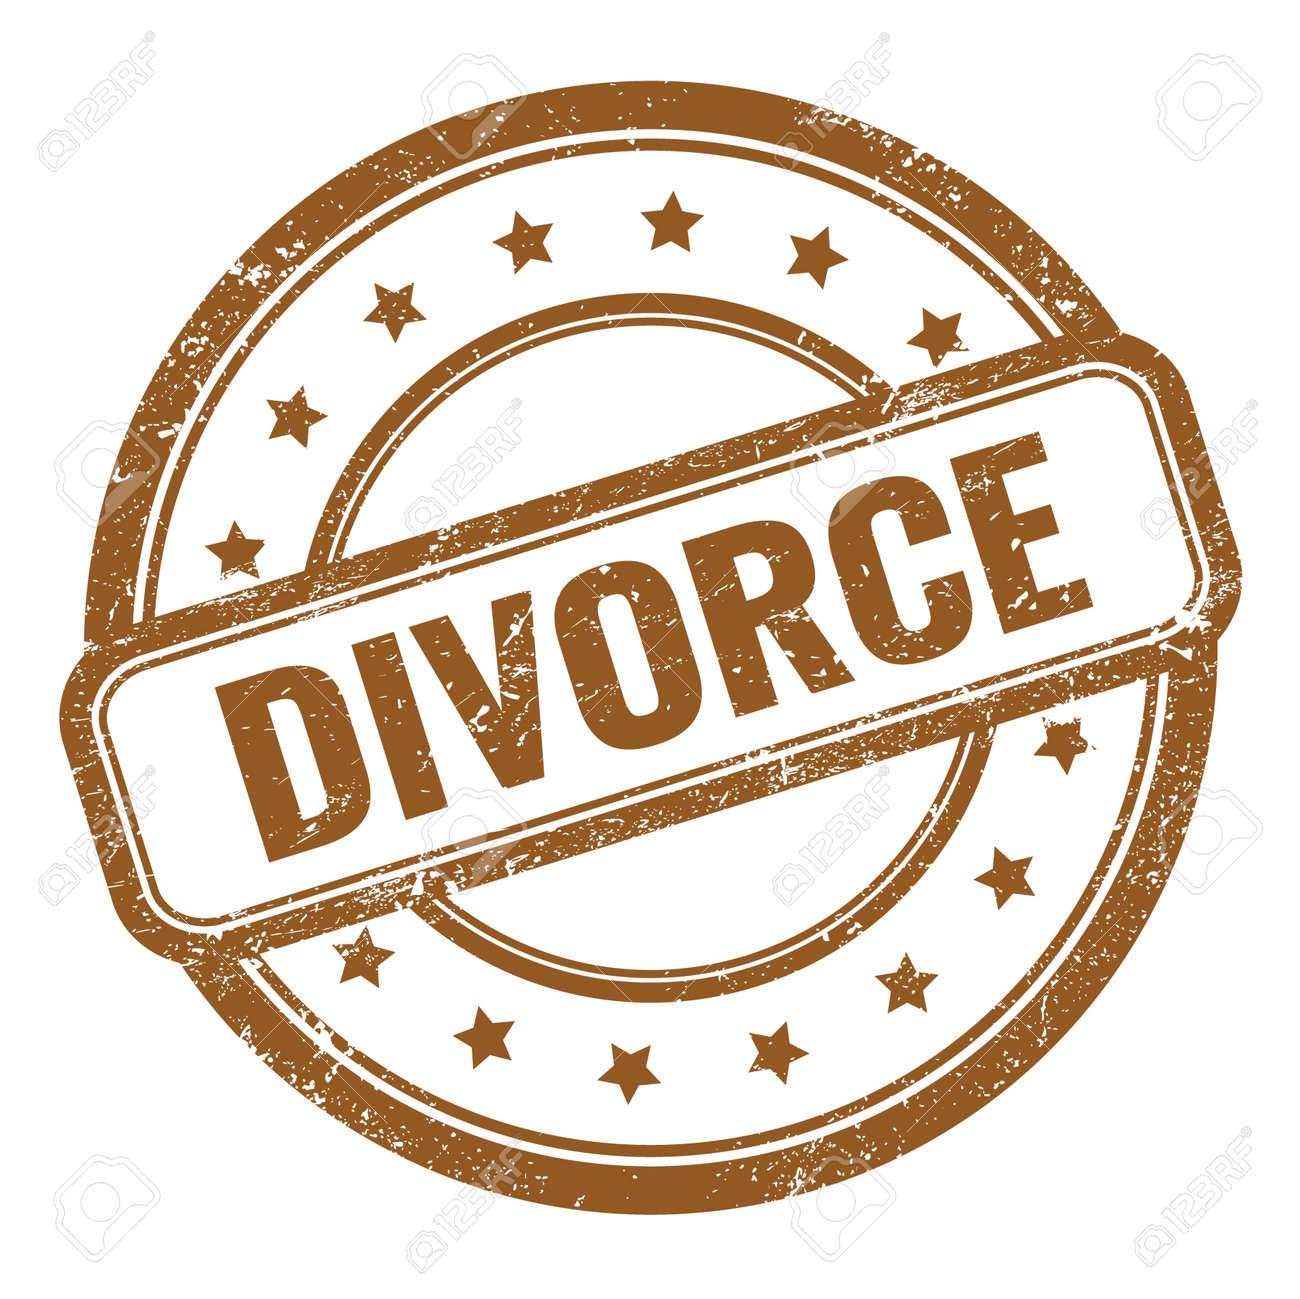 DIVORCE text on brown grungy vintage round rubber stamp. - 169909336